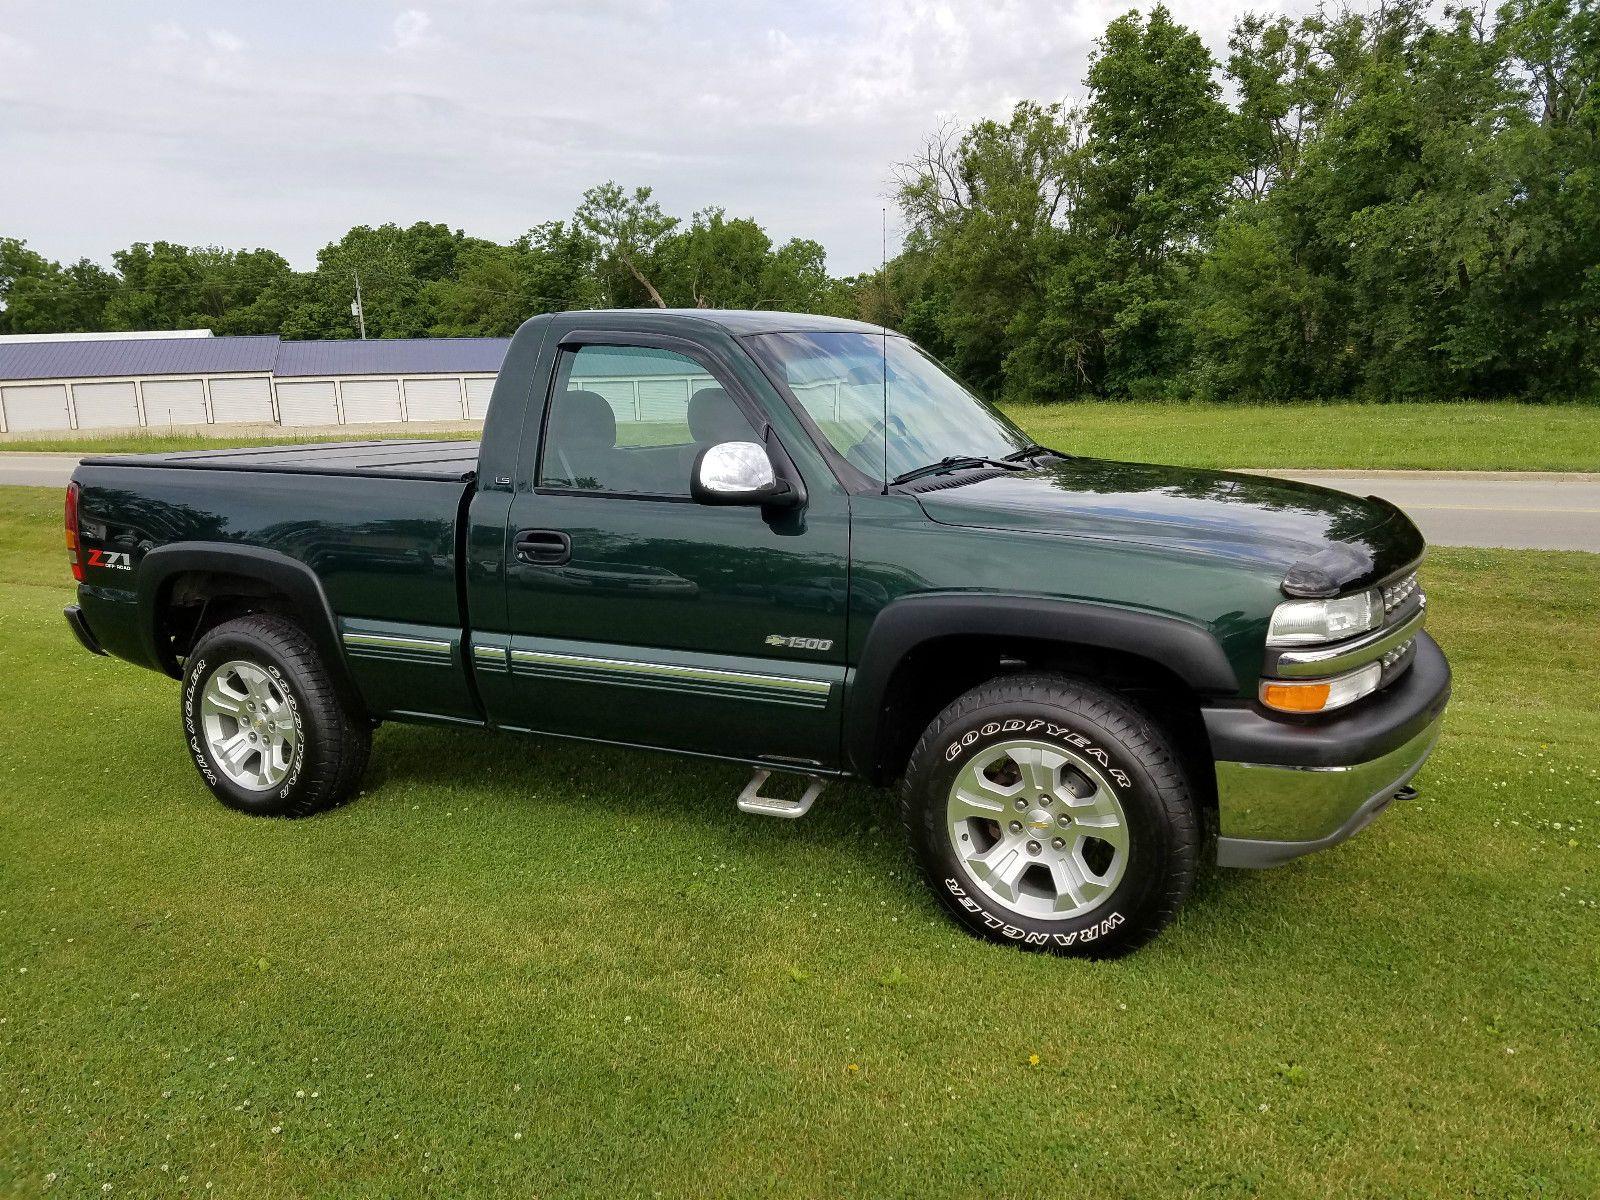 Chevrolet other pickups z71 2001 chevrolet silverado 1500 ls z 71 truck